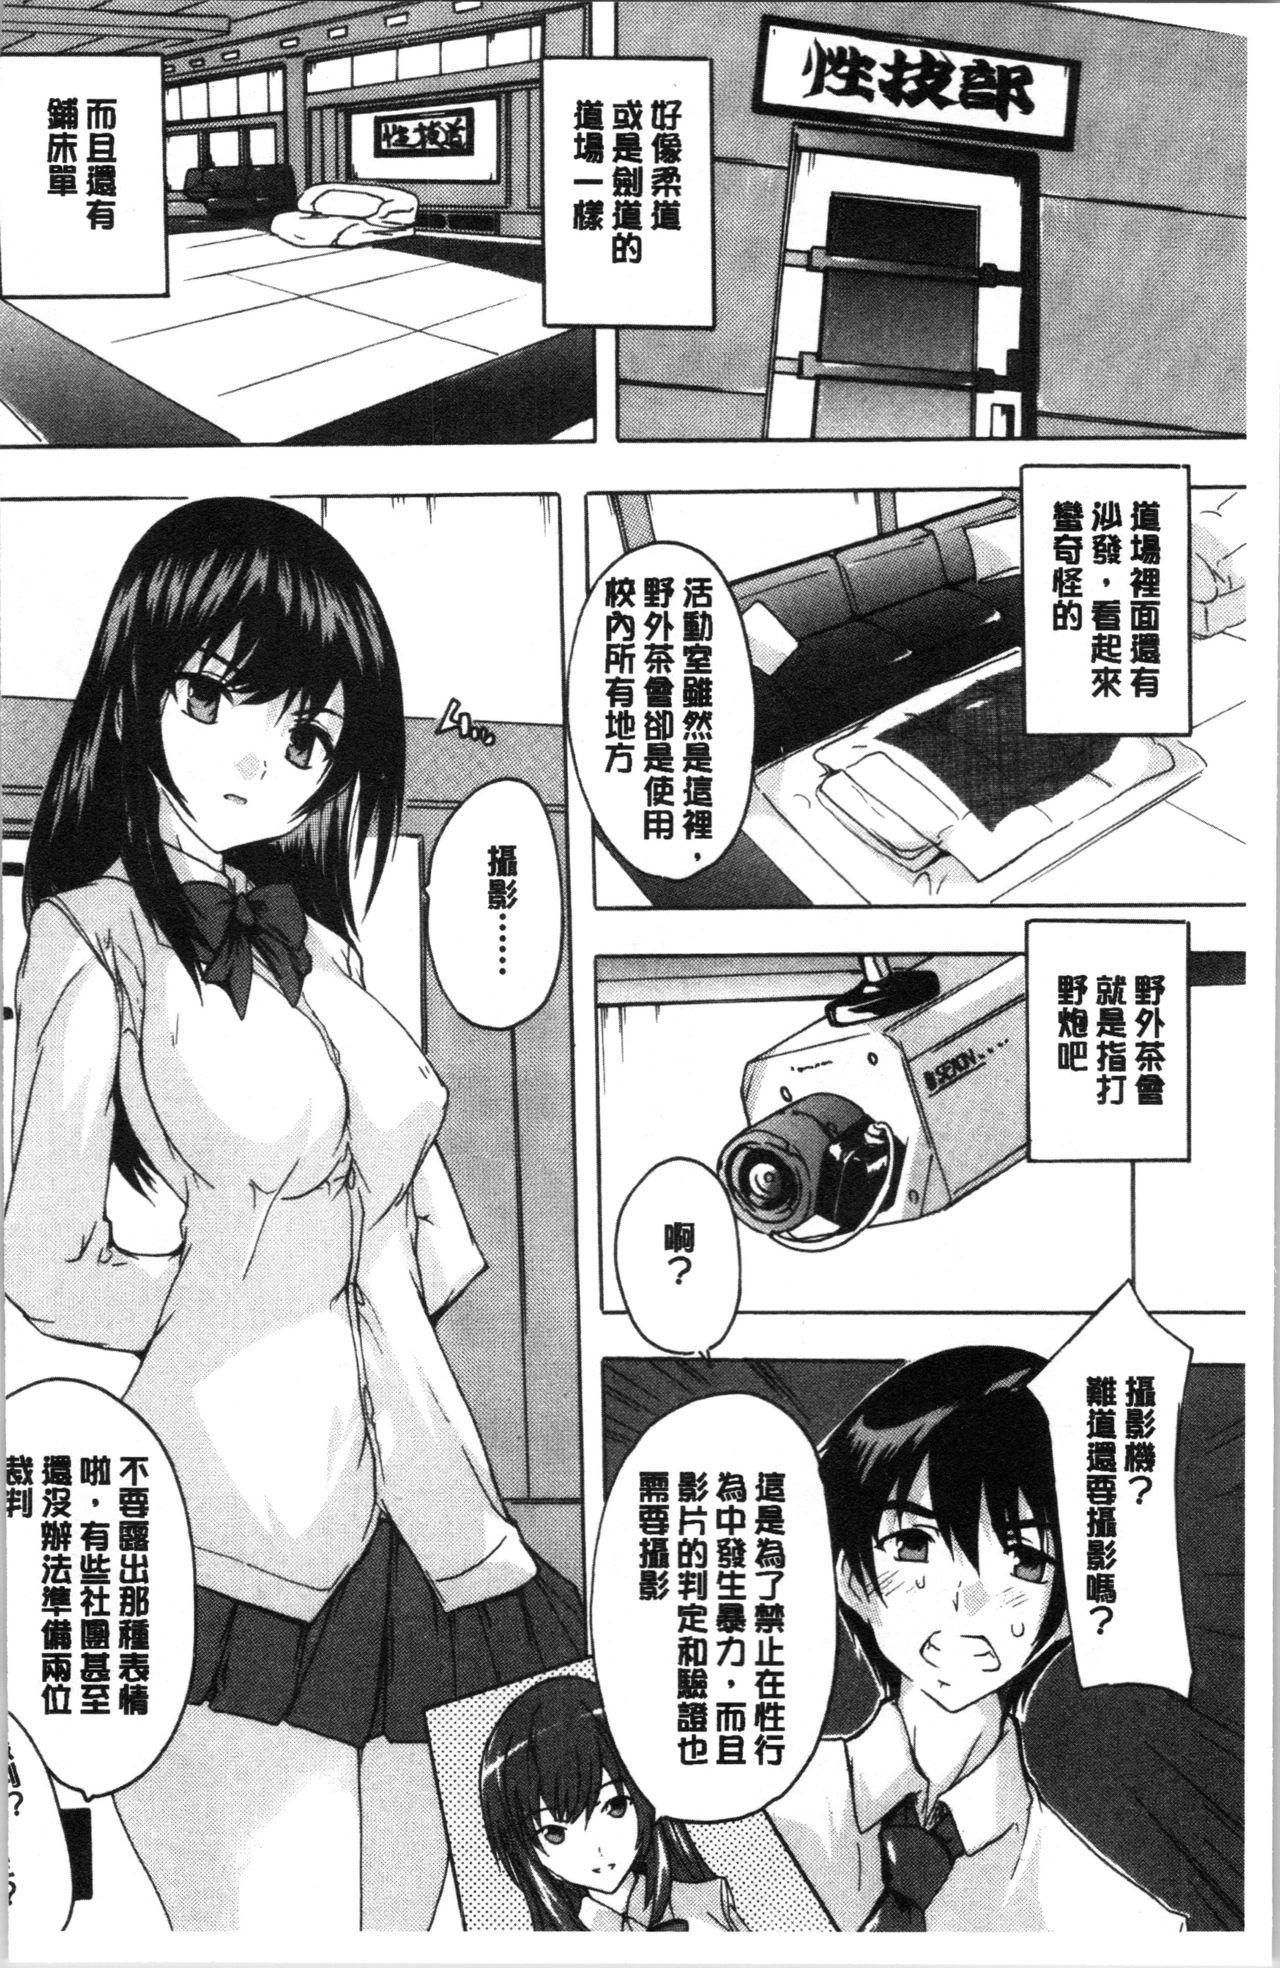 [Natsuka Q-Ya] Hisshuu!! Sex-bu - SEIGI-DO The Ultimate Martial Arts   必修!!性愛淫交部 [Chinese] 12